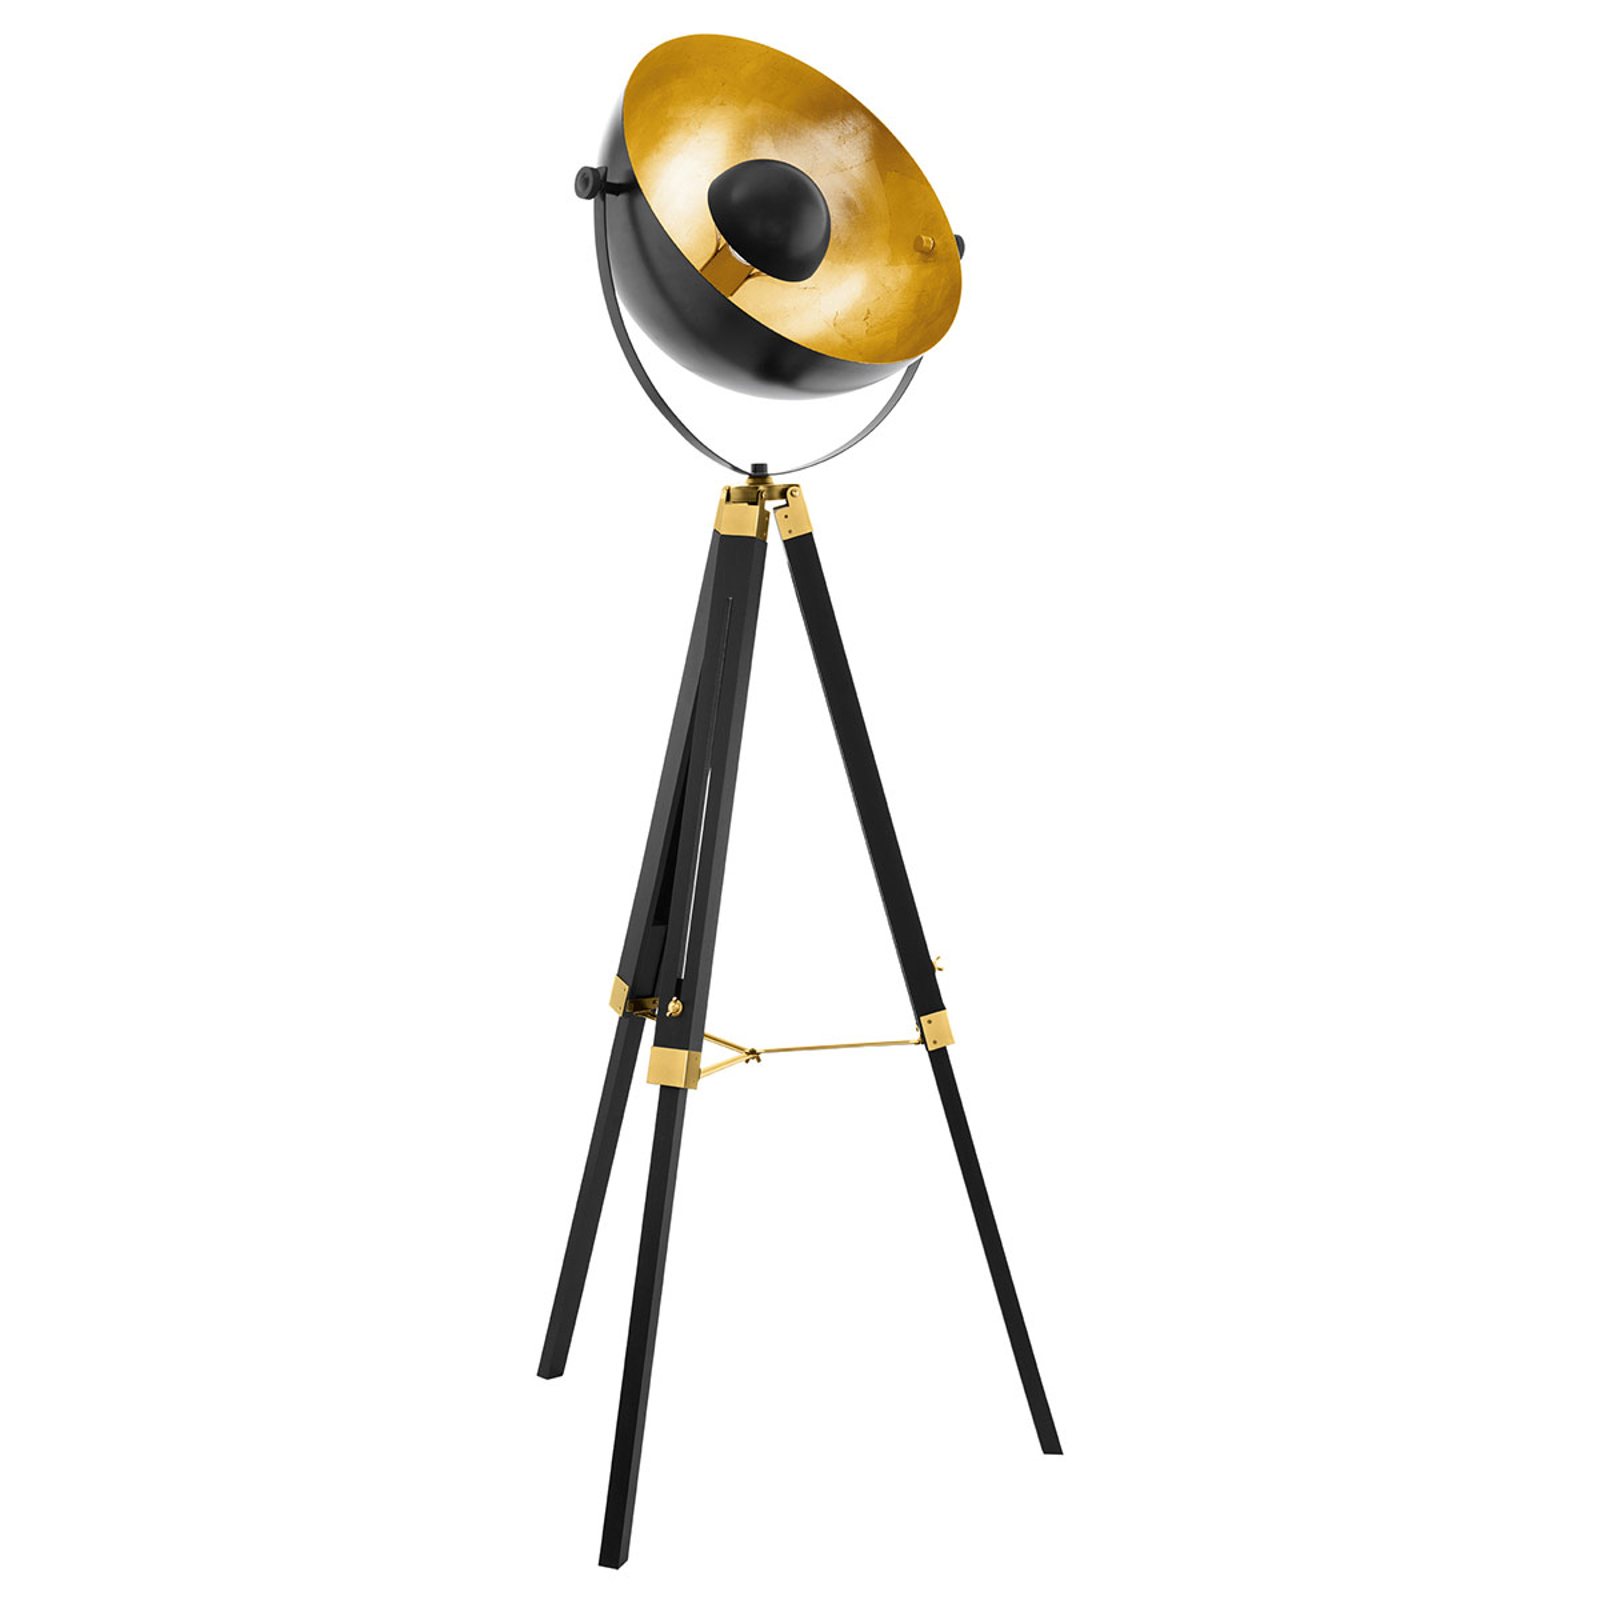 Golvlampa Covaleda med trebent stativ svart/guld